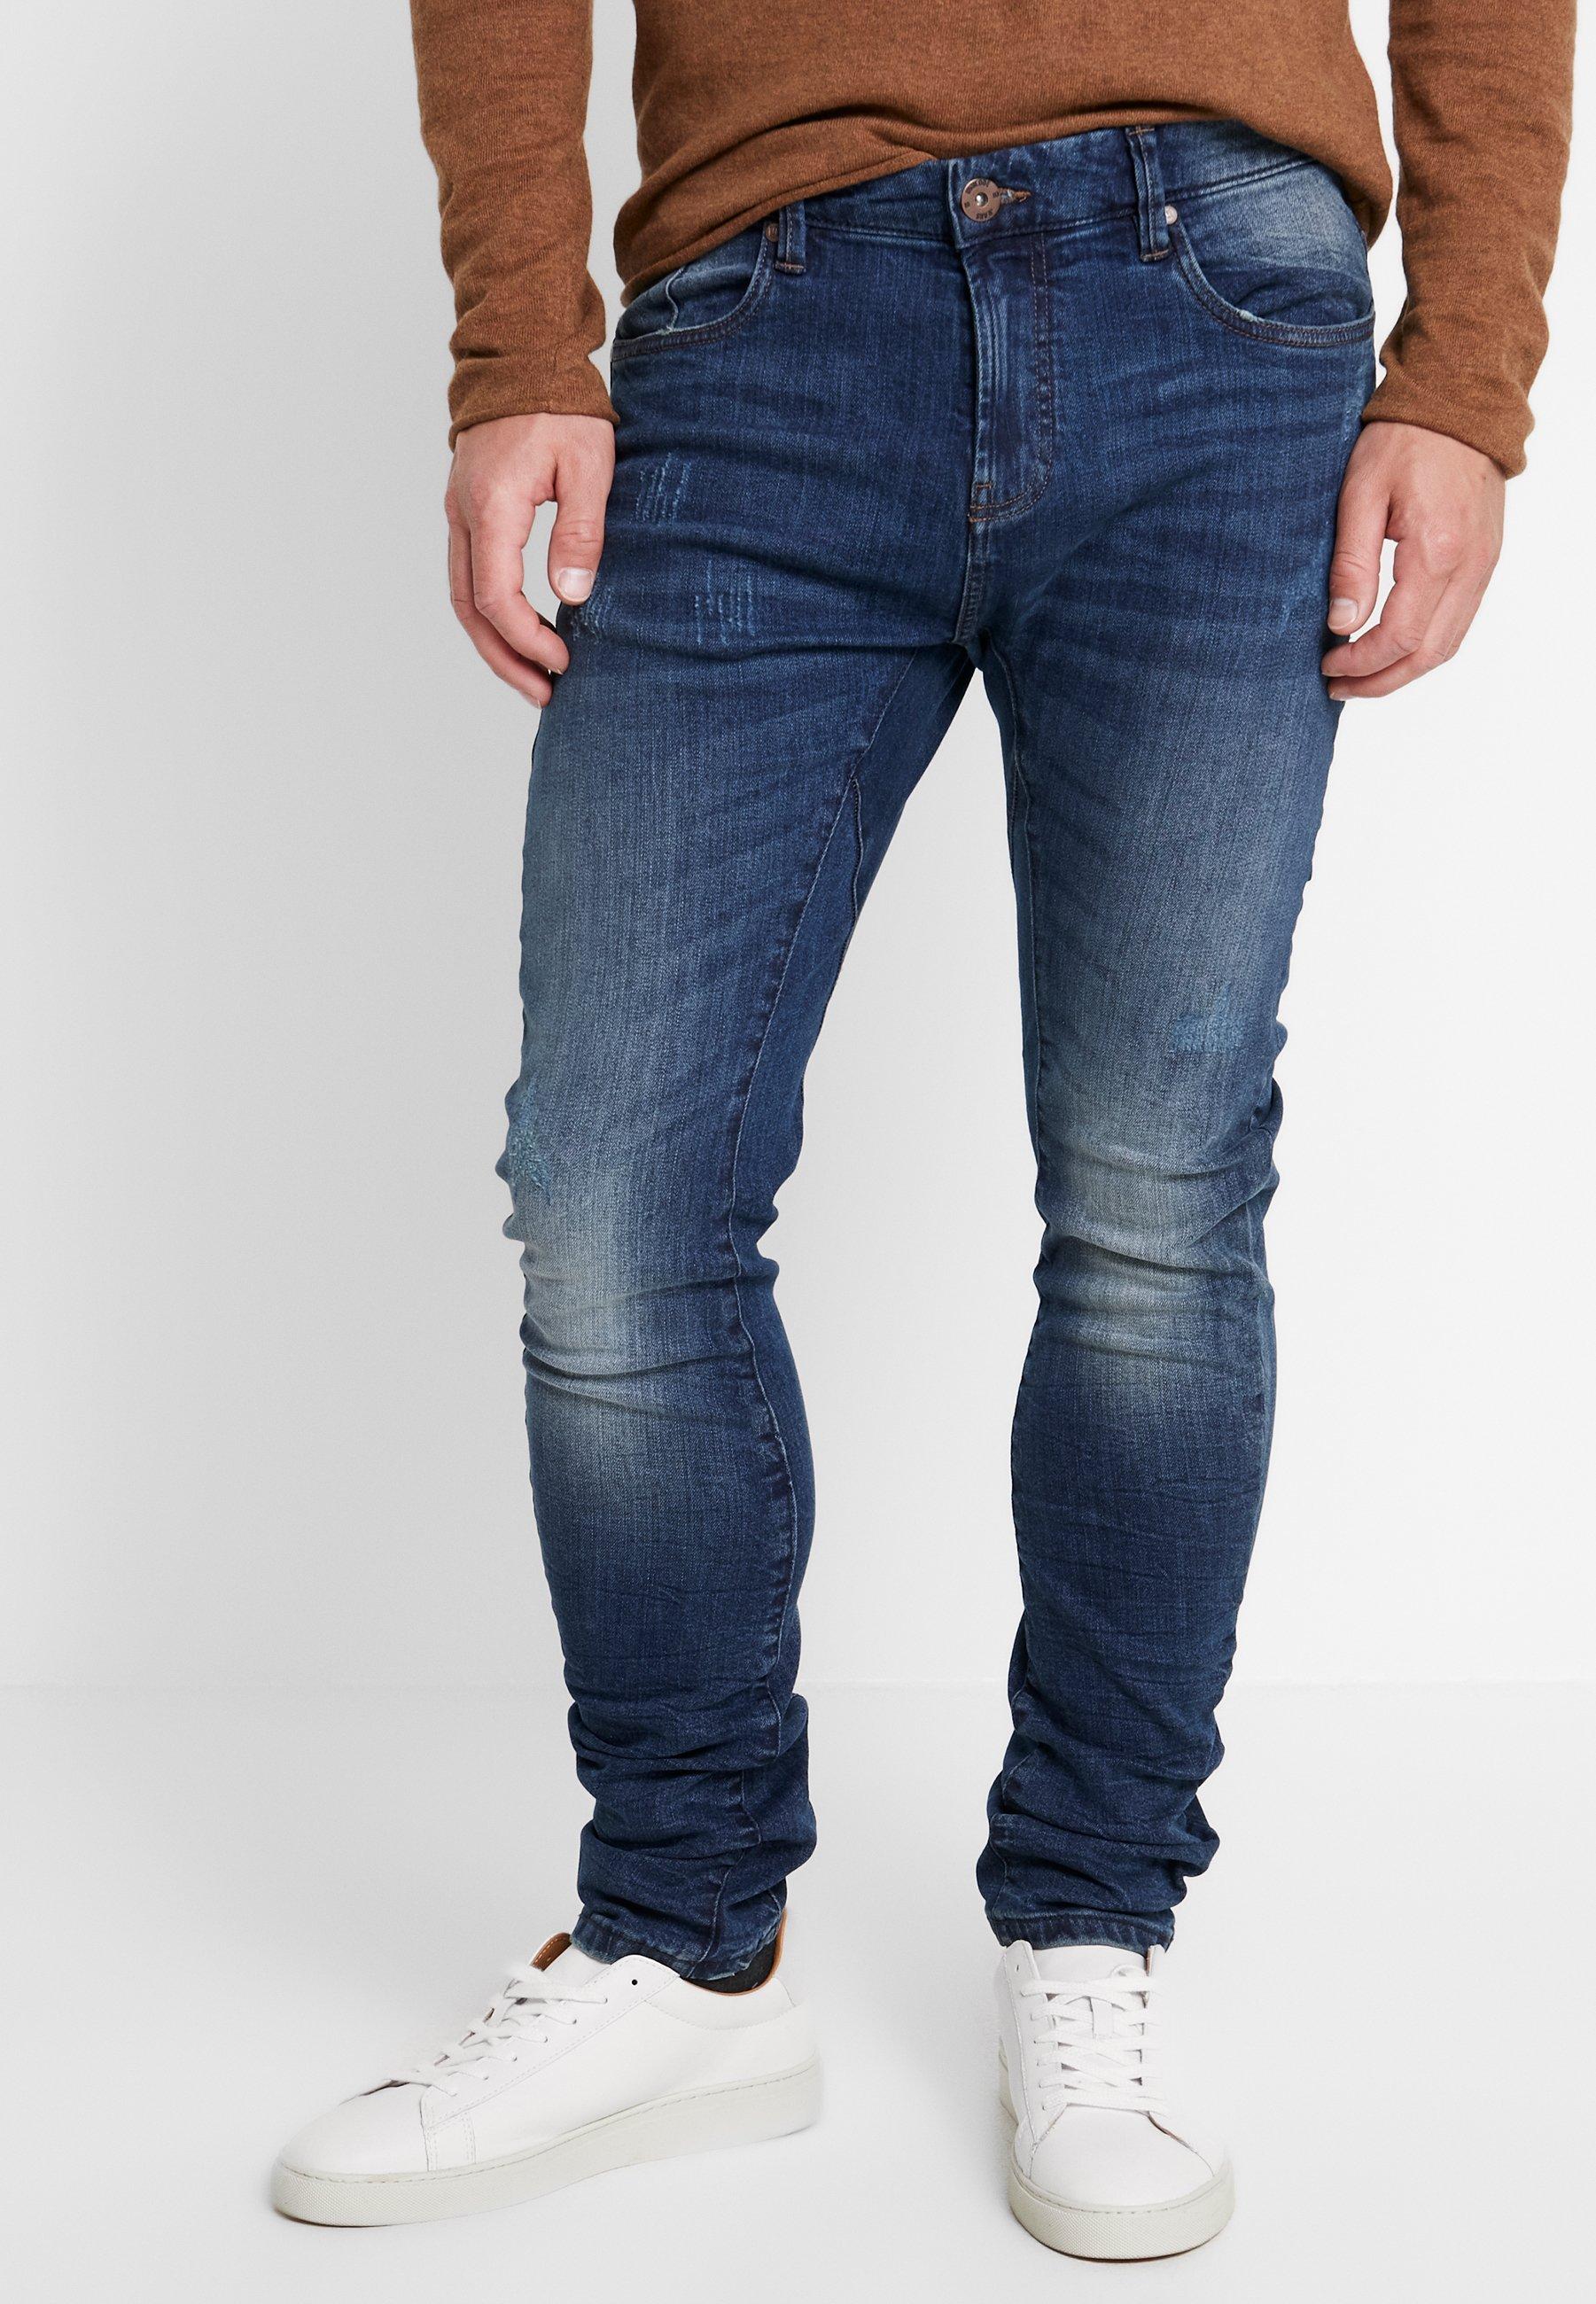 Denim Blue Indicode LearFuselé Jeans LearFuselé Indicode Jeans 9H2IeEDWY